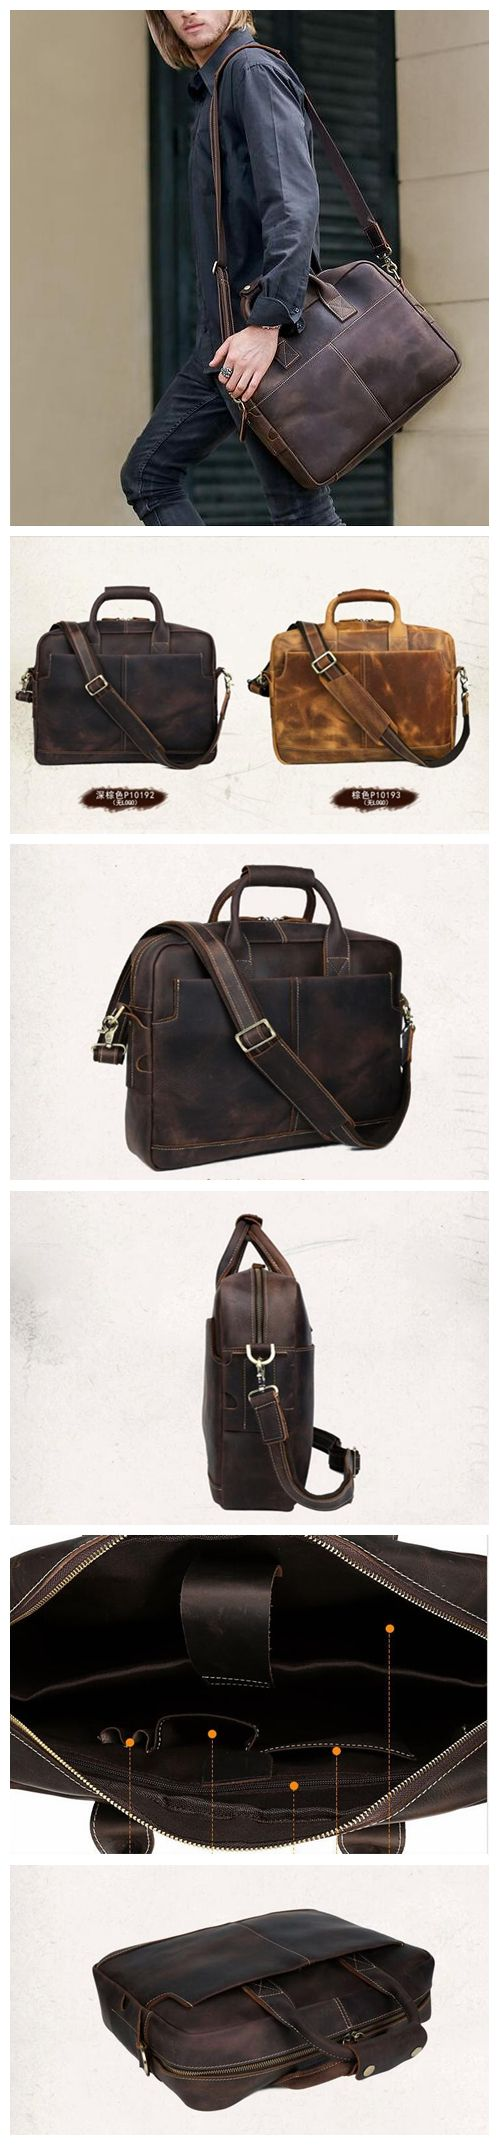 Men's Leather Retro Briefcase Laptop Sleeve Shoulder Bag